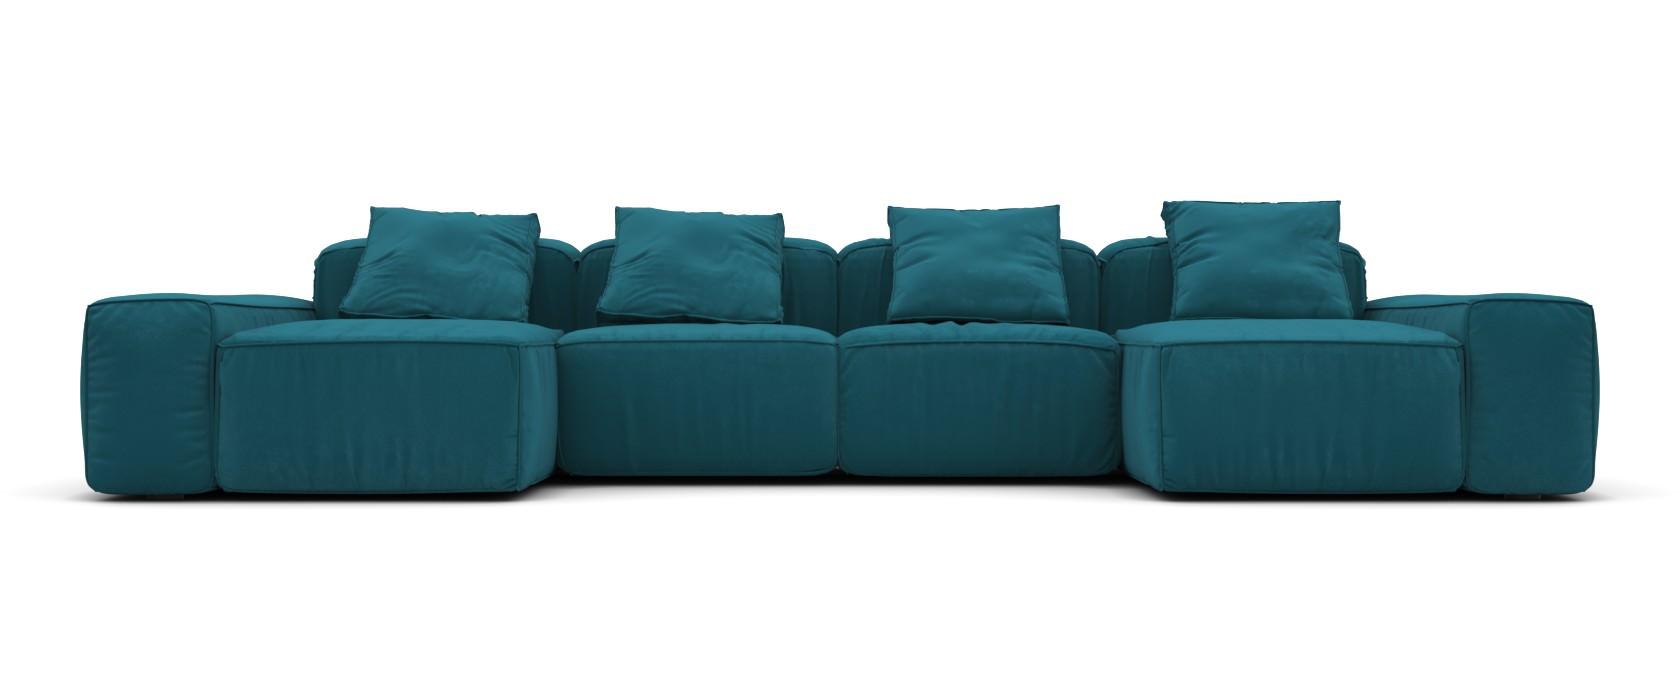 Угловой диван Abele Classic П образный - Pufetto